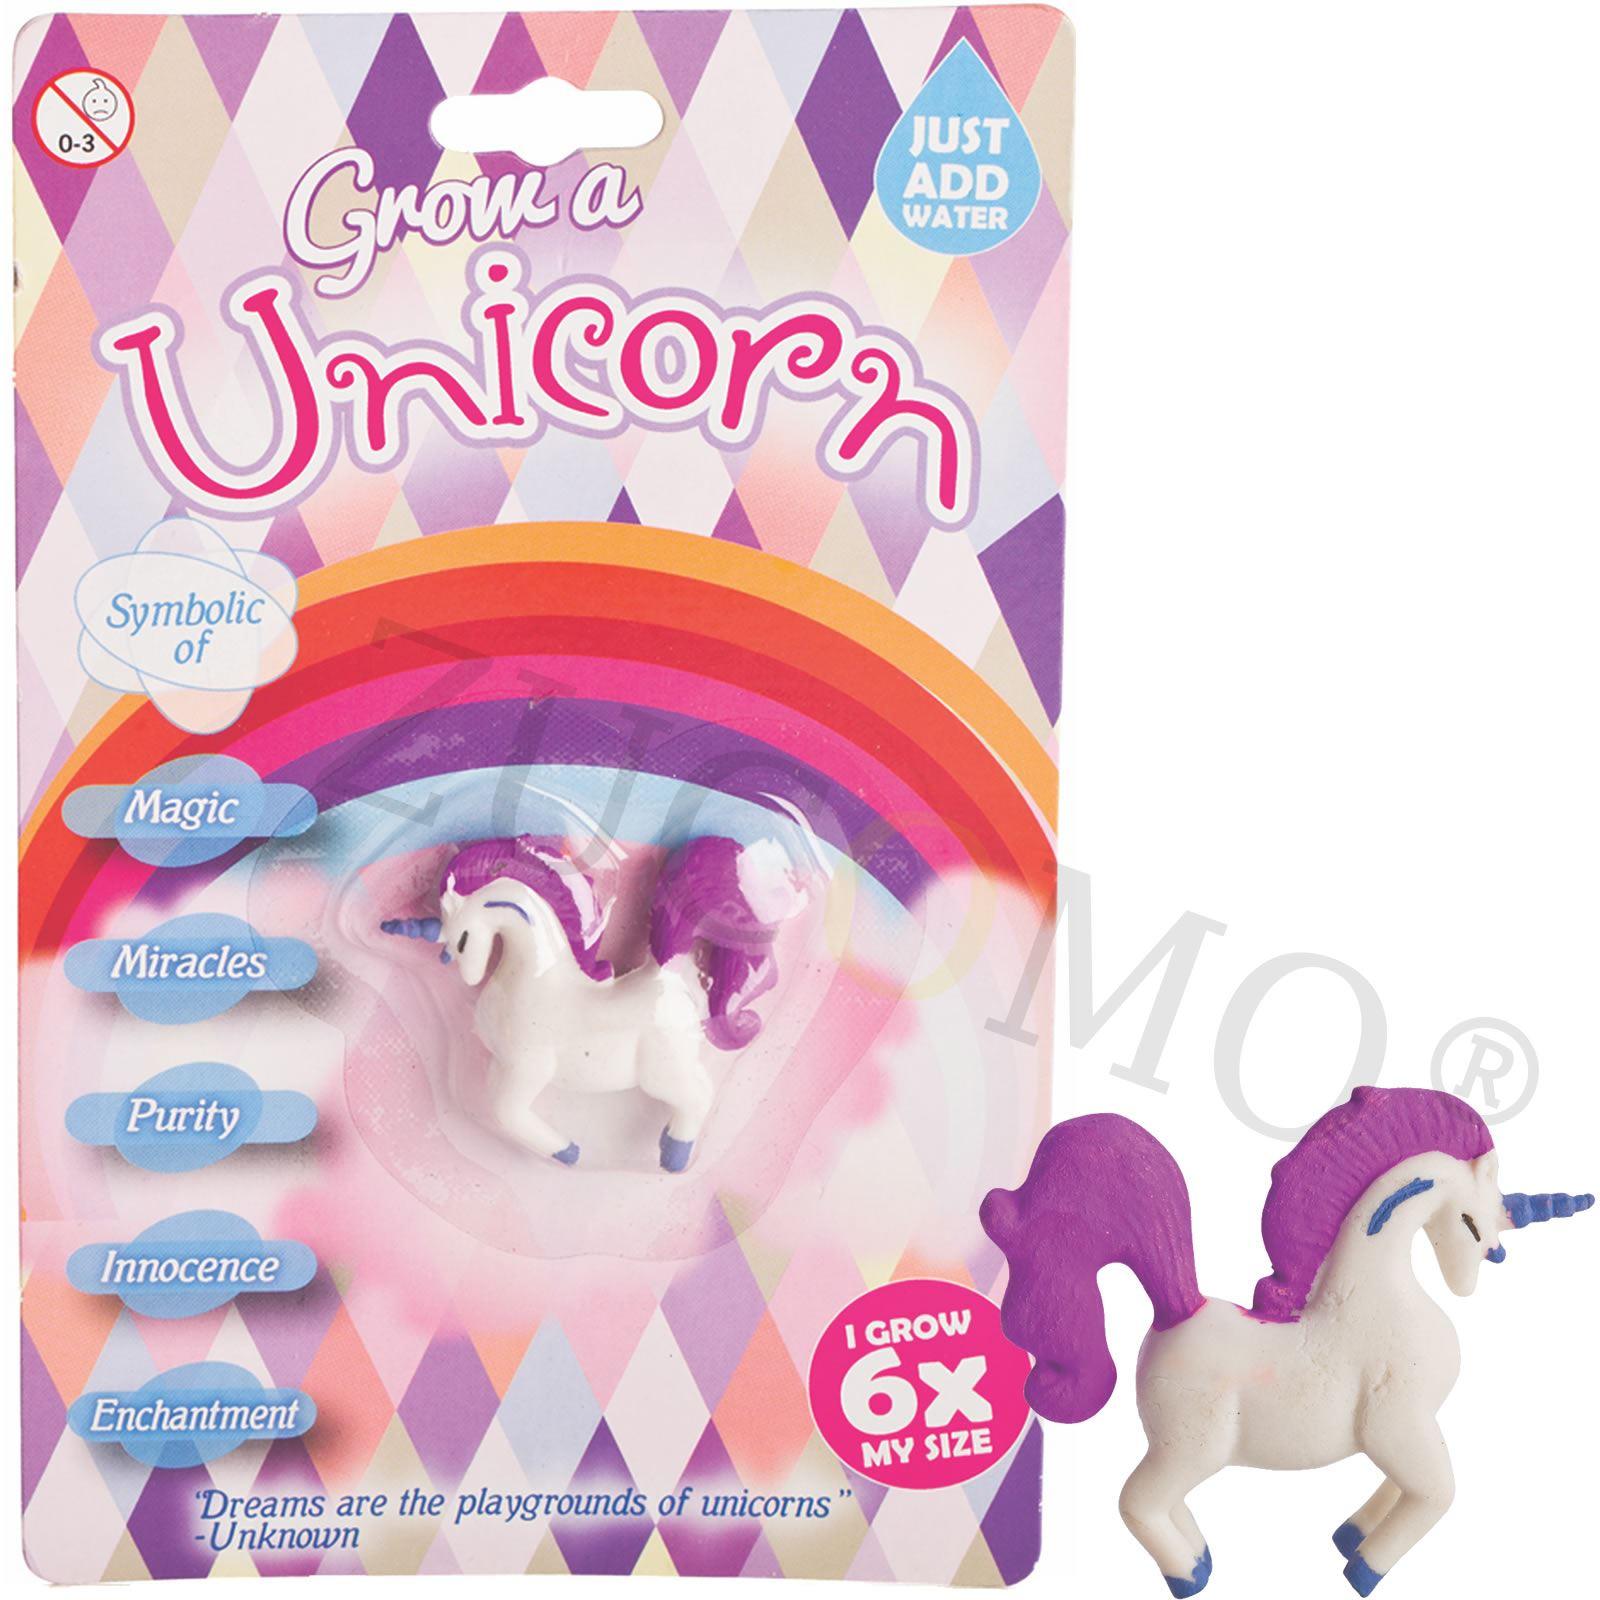 Grow A Unicorn Kids Christmas Gifts Ideas Xmas Stocking Fillers